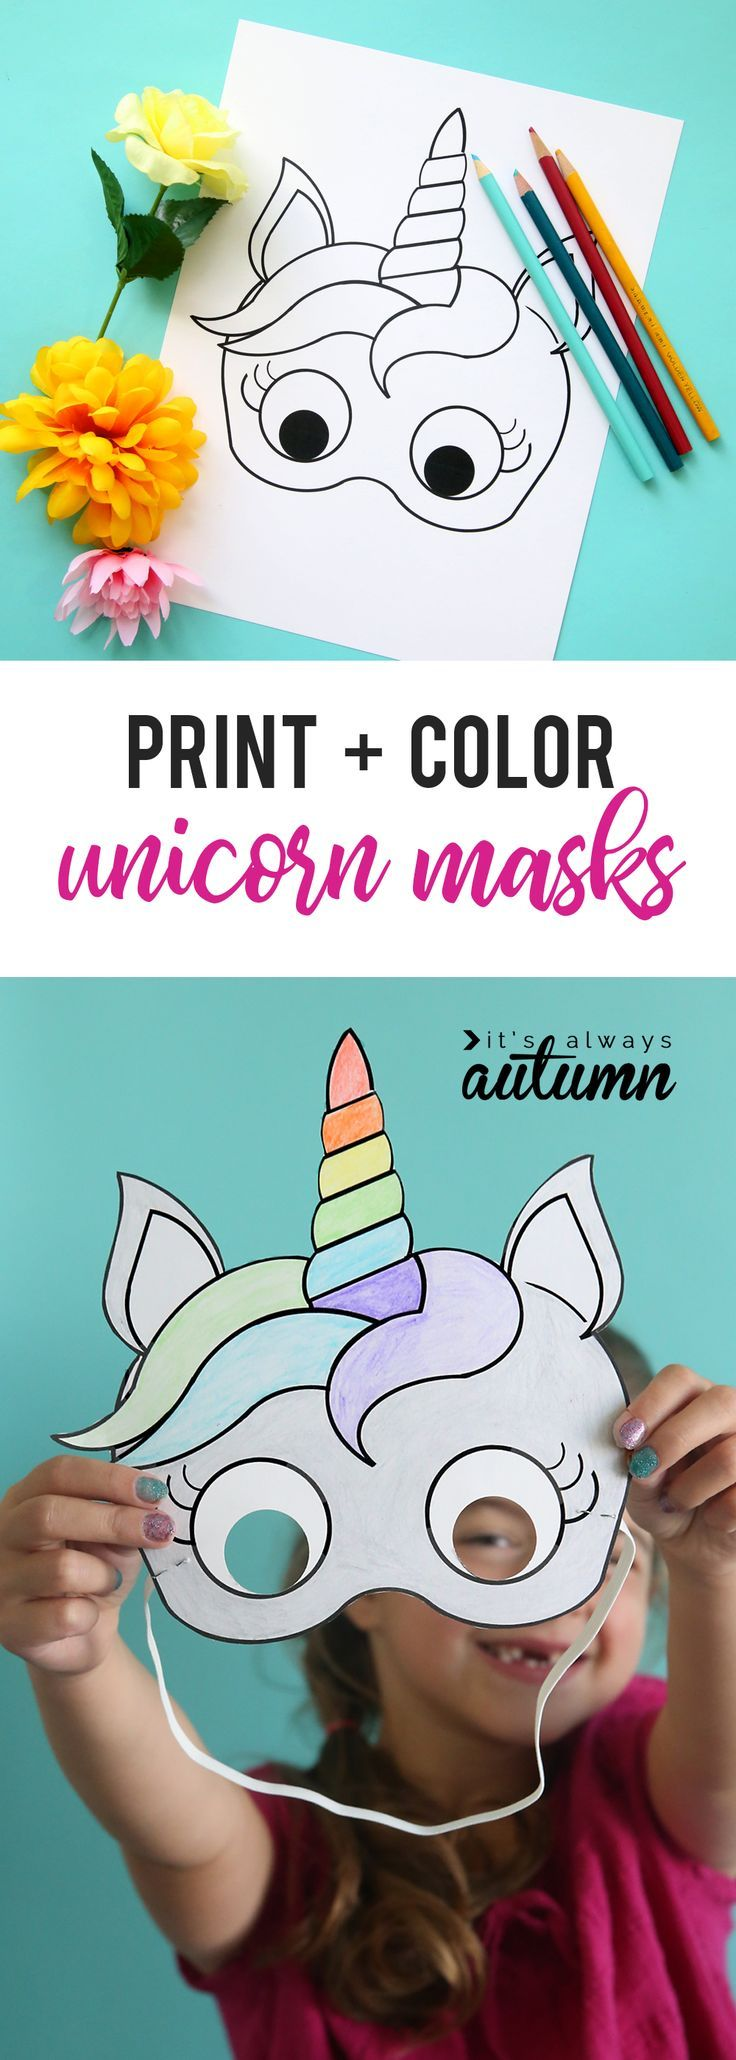 unicorn masks to print and color {free printable | Unicornios ...